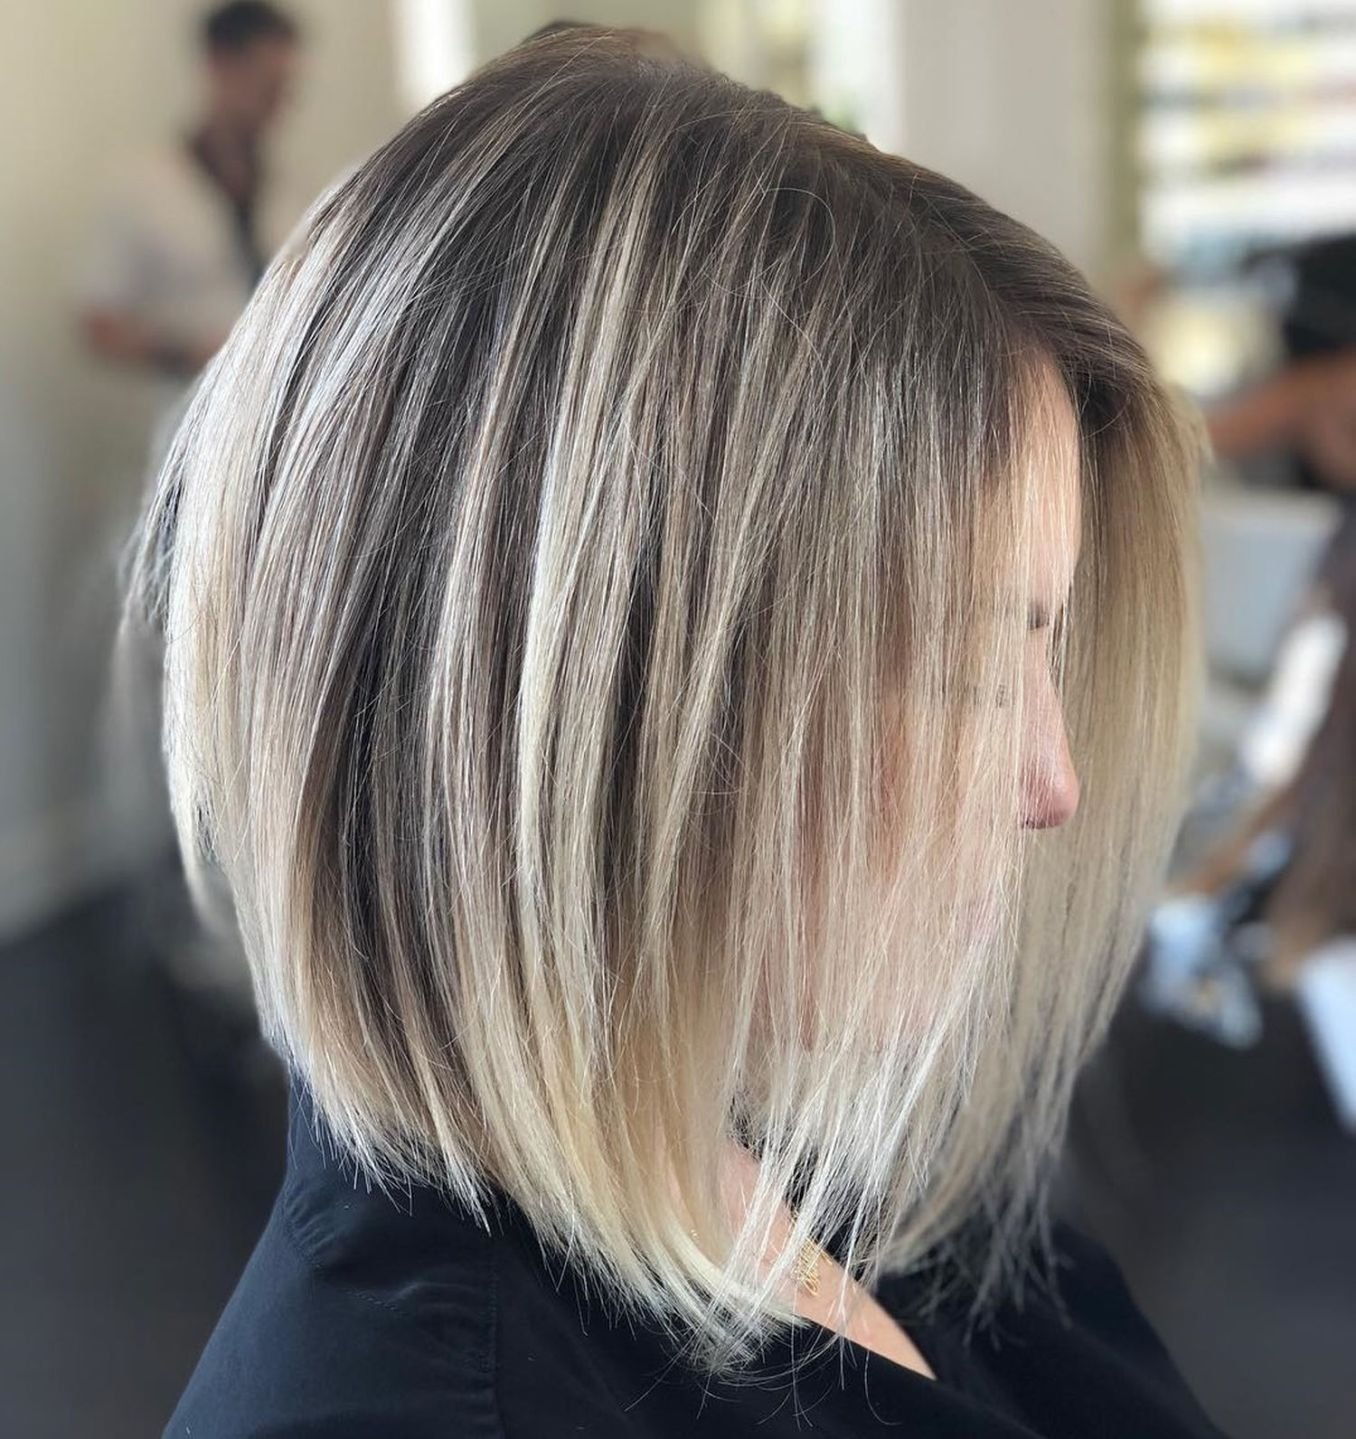 11 Perfect Medium Length Hairstyles for Thin Hair  Medium length